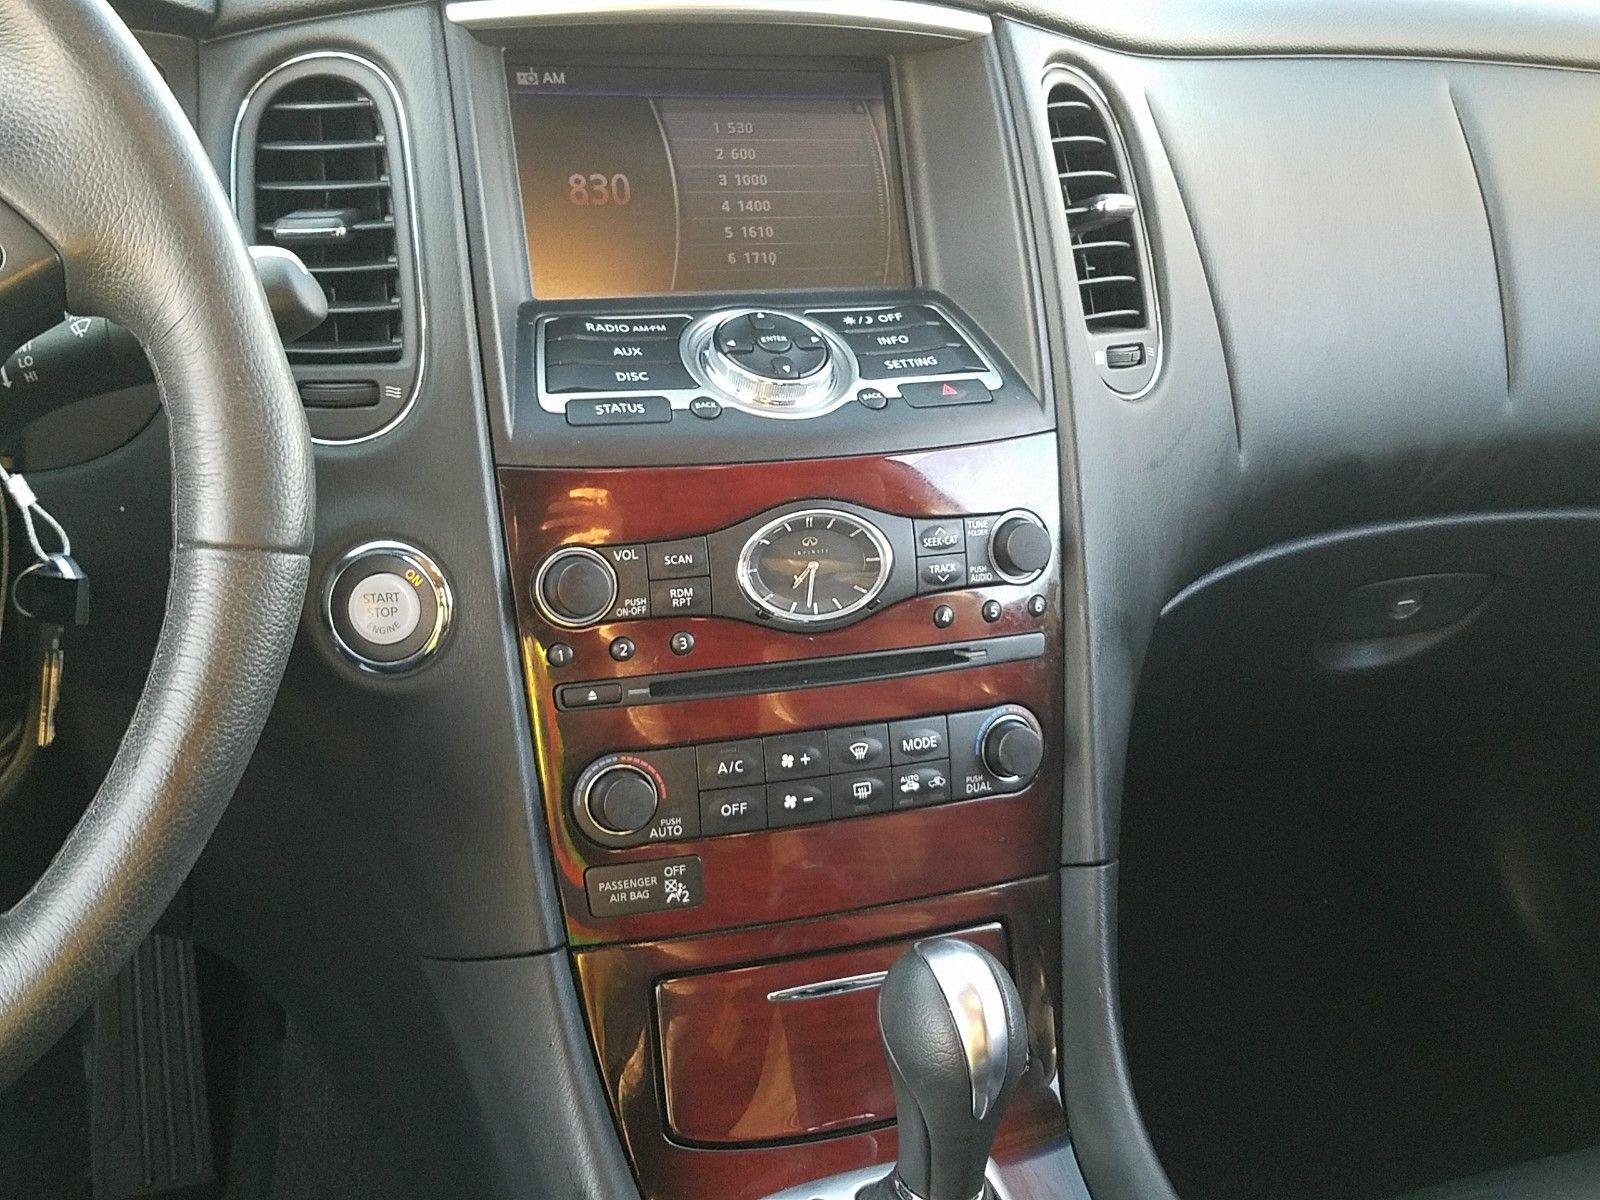 2017 Infiniti Qx50 Used Car Auction Car Export Auctionxm